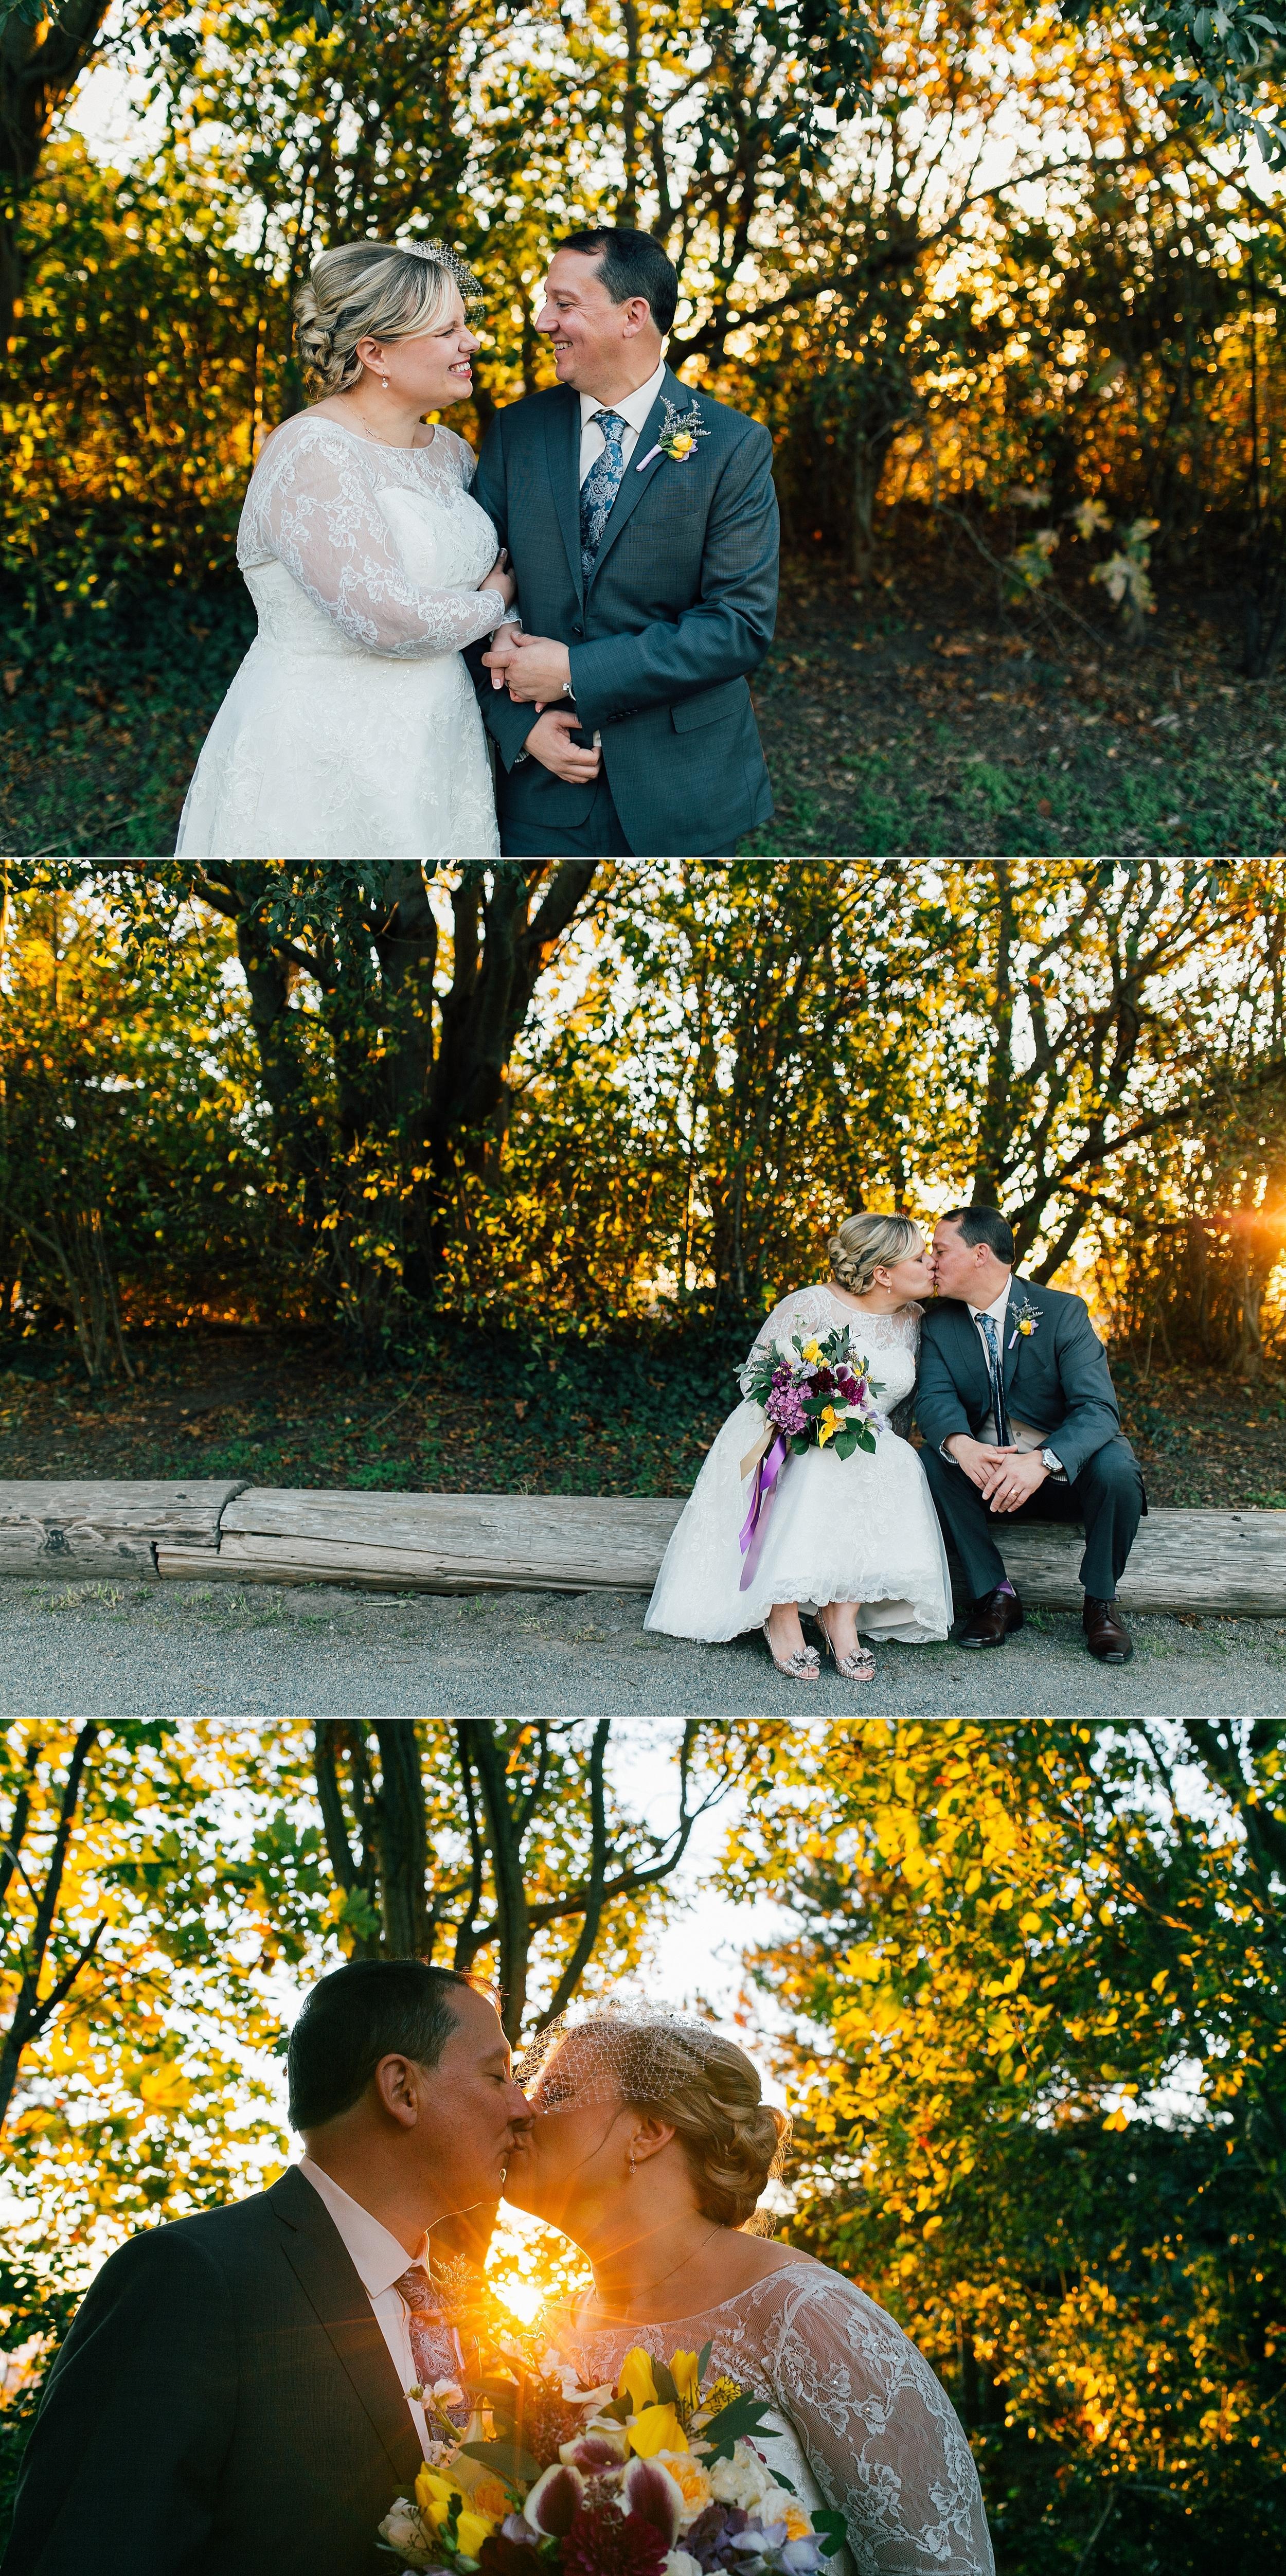 ashley vos photography seattle area wedding photographer_0837.jpg